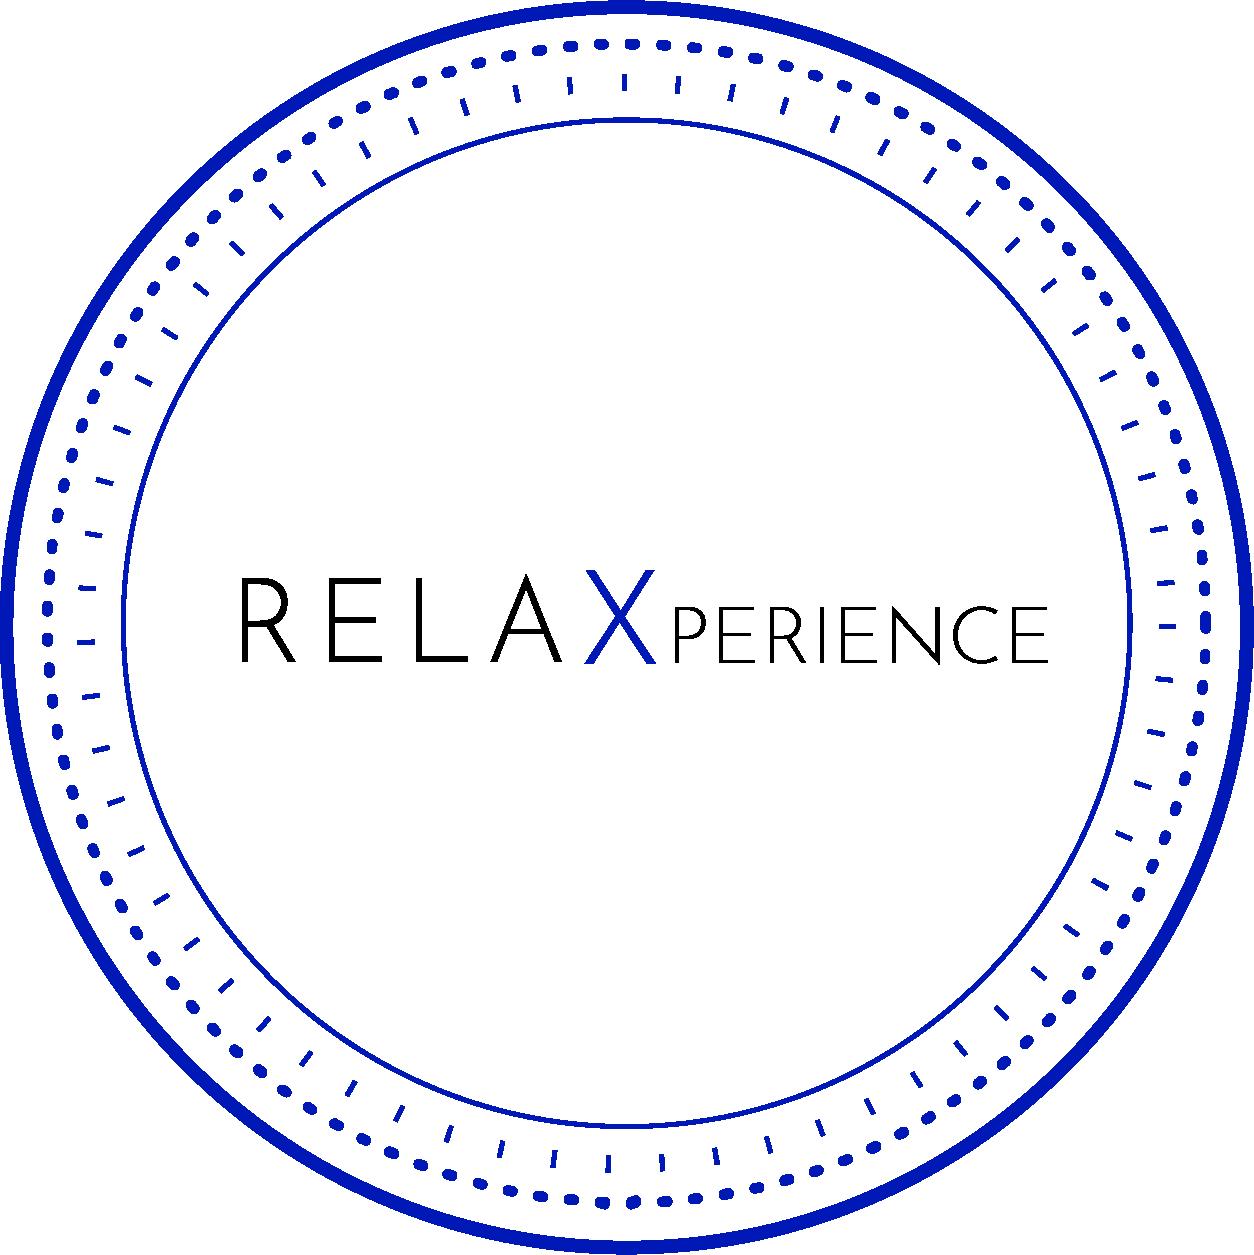 RelaXperience Logo 210614 - Relaxation profonde - Régulation émotionnelle